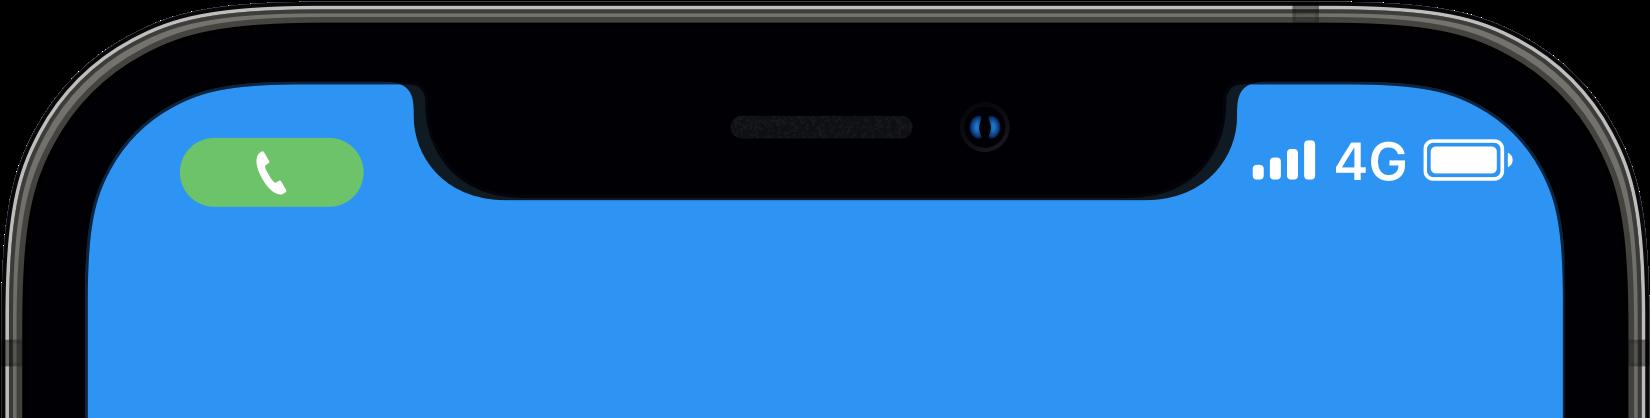 Flexfone har 5g dækning i hele Danmark